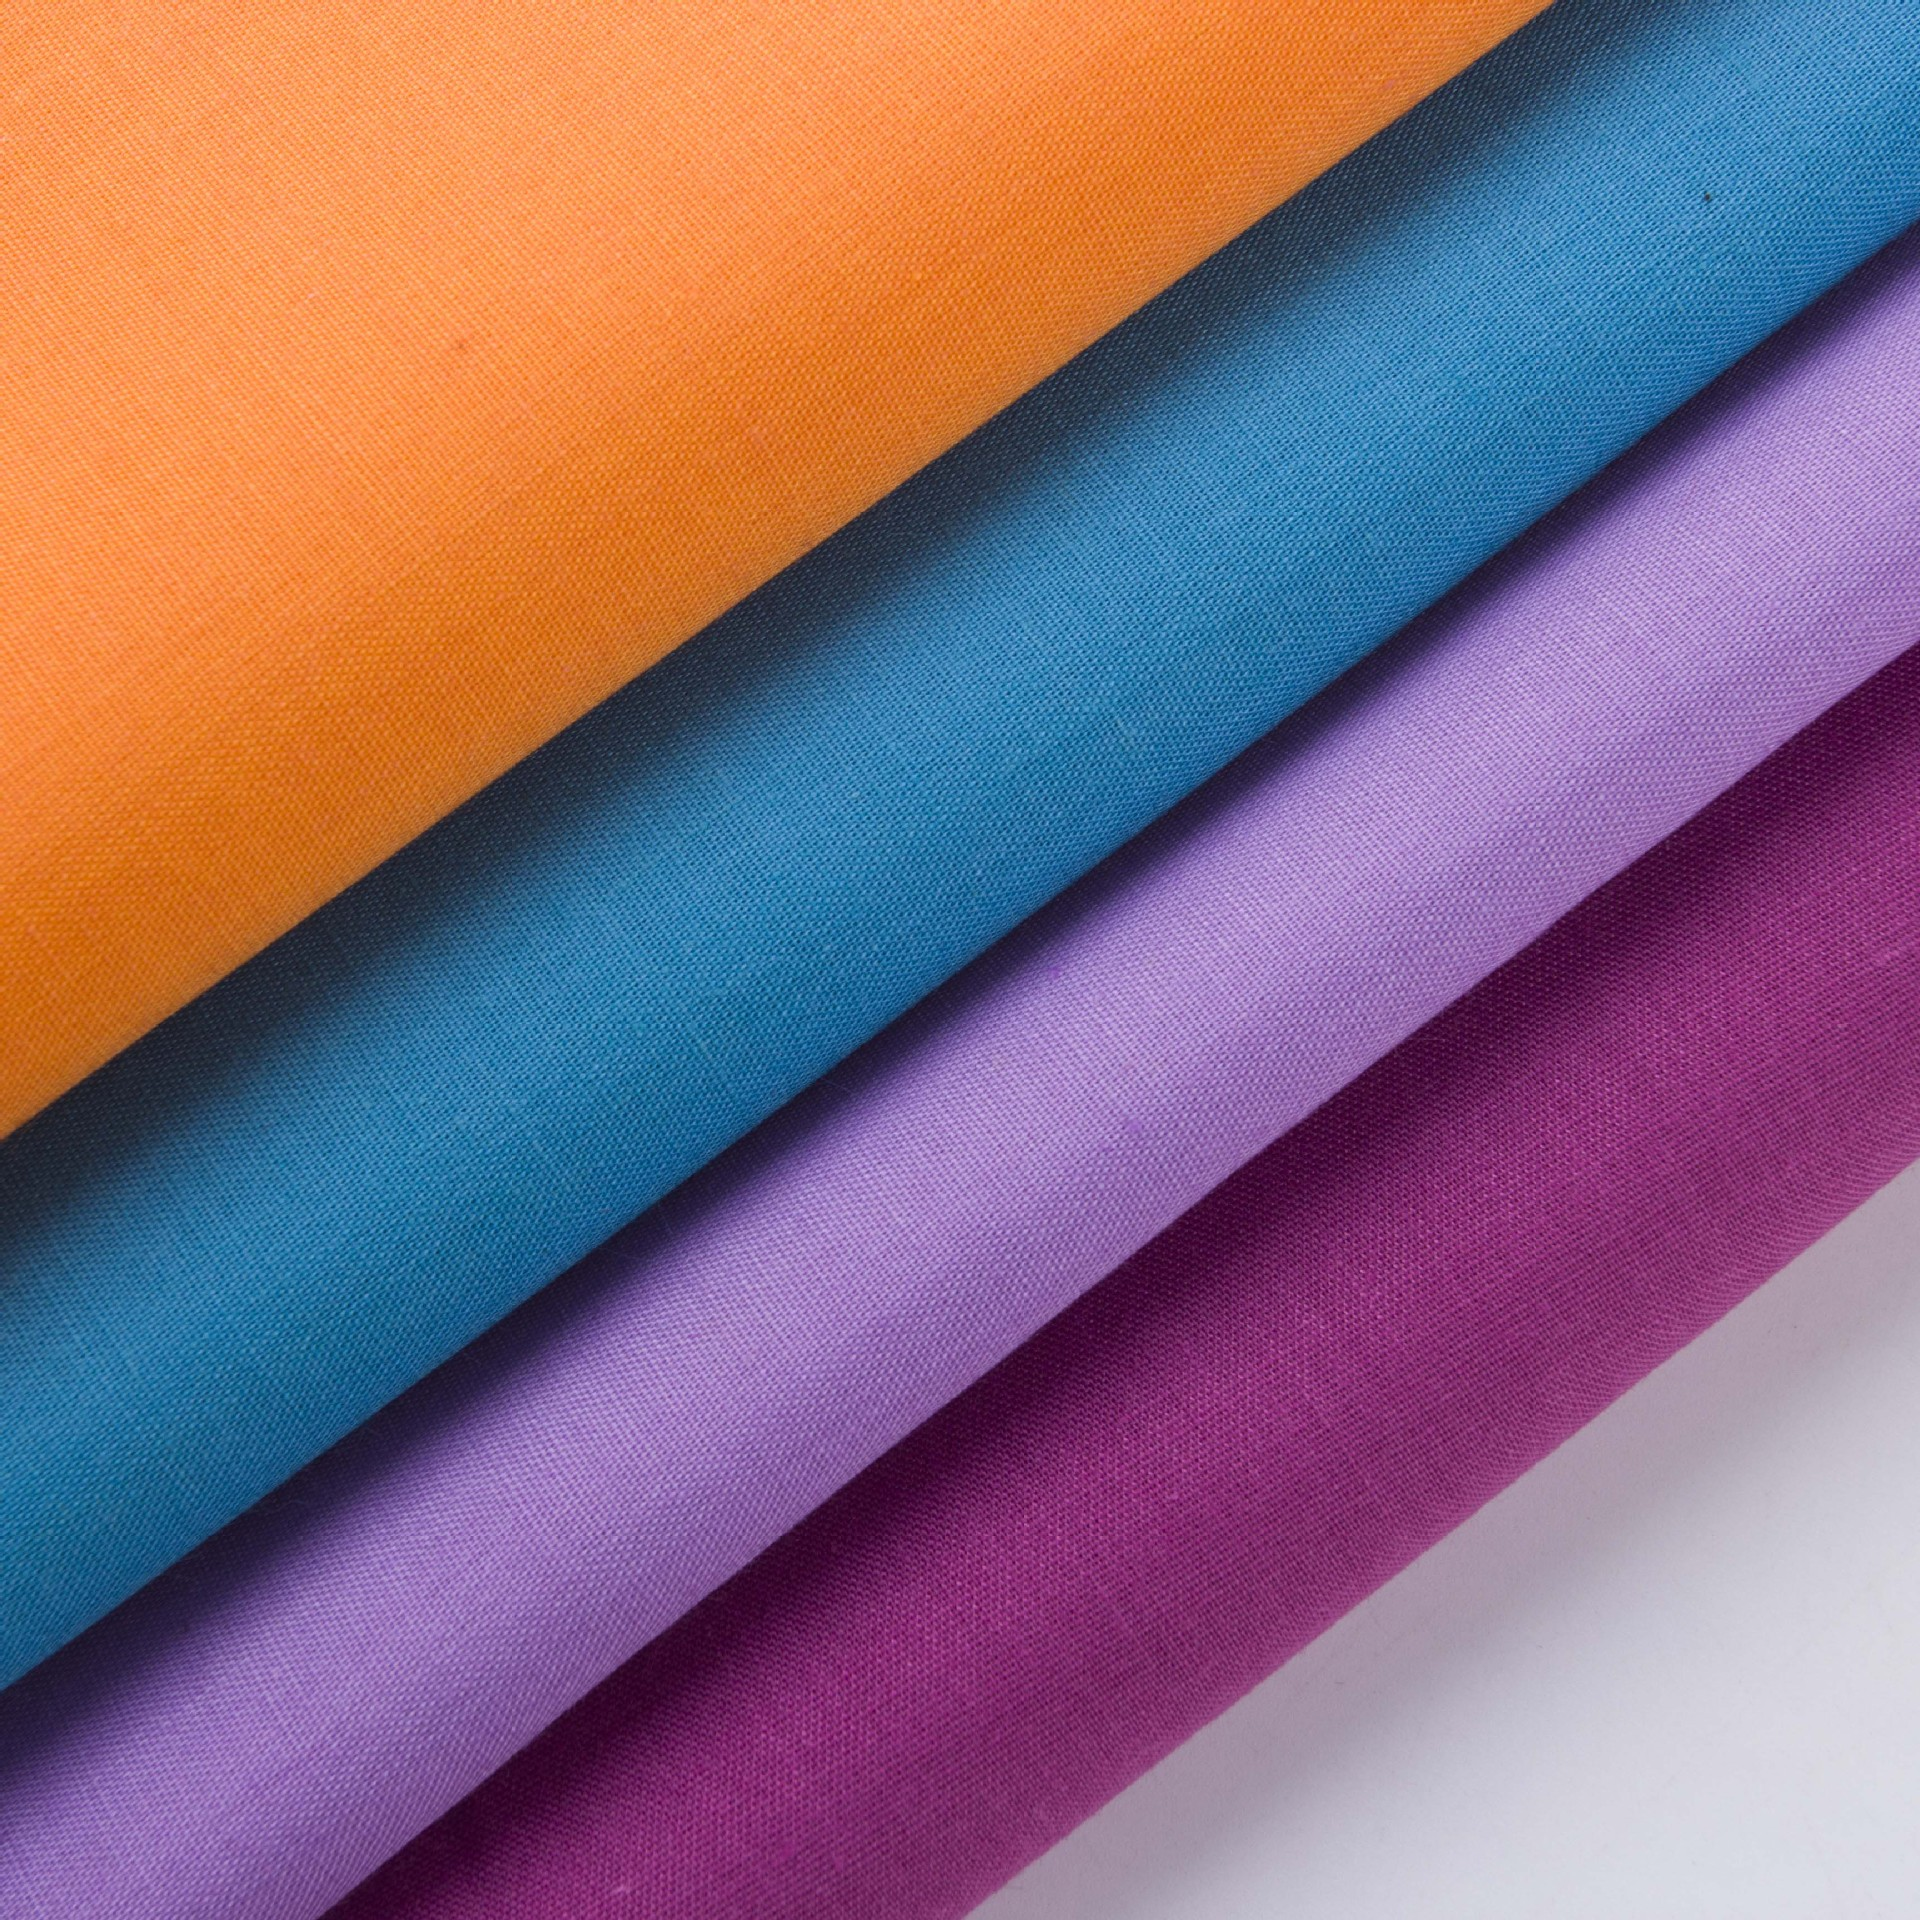 HAOLAN TC polyester cotton 96 * 72 pocket fabric dacron fabric polyester cotton blended edging linin